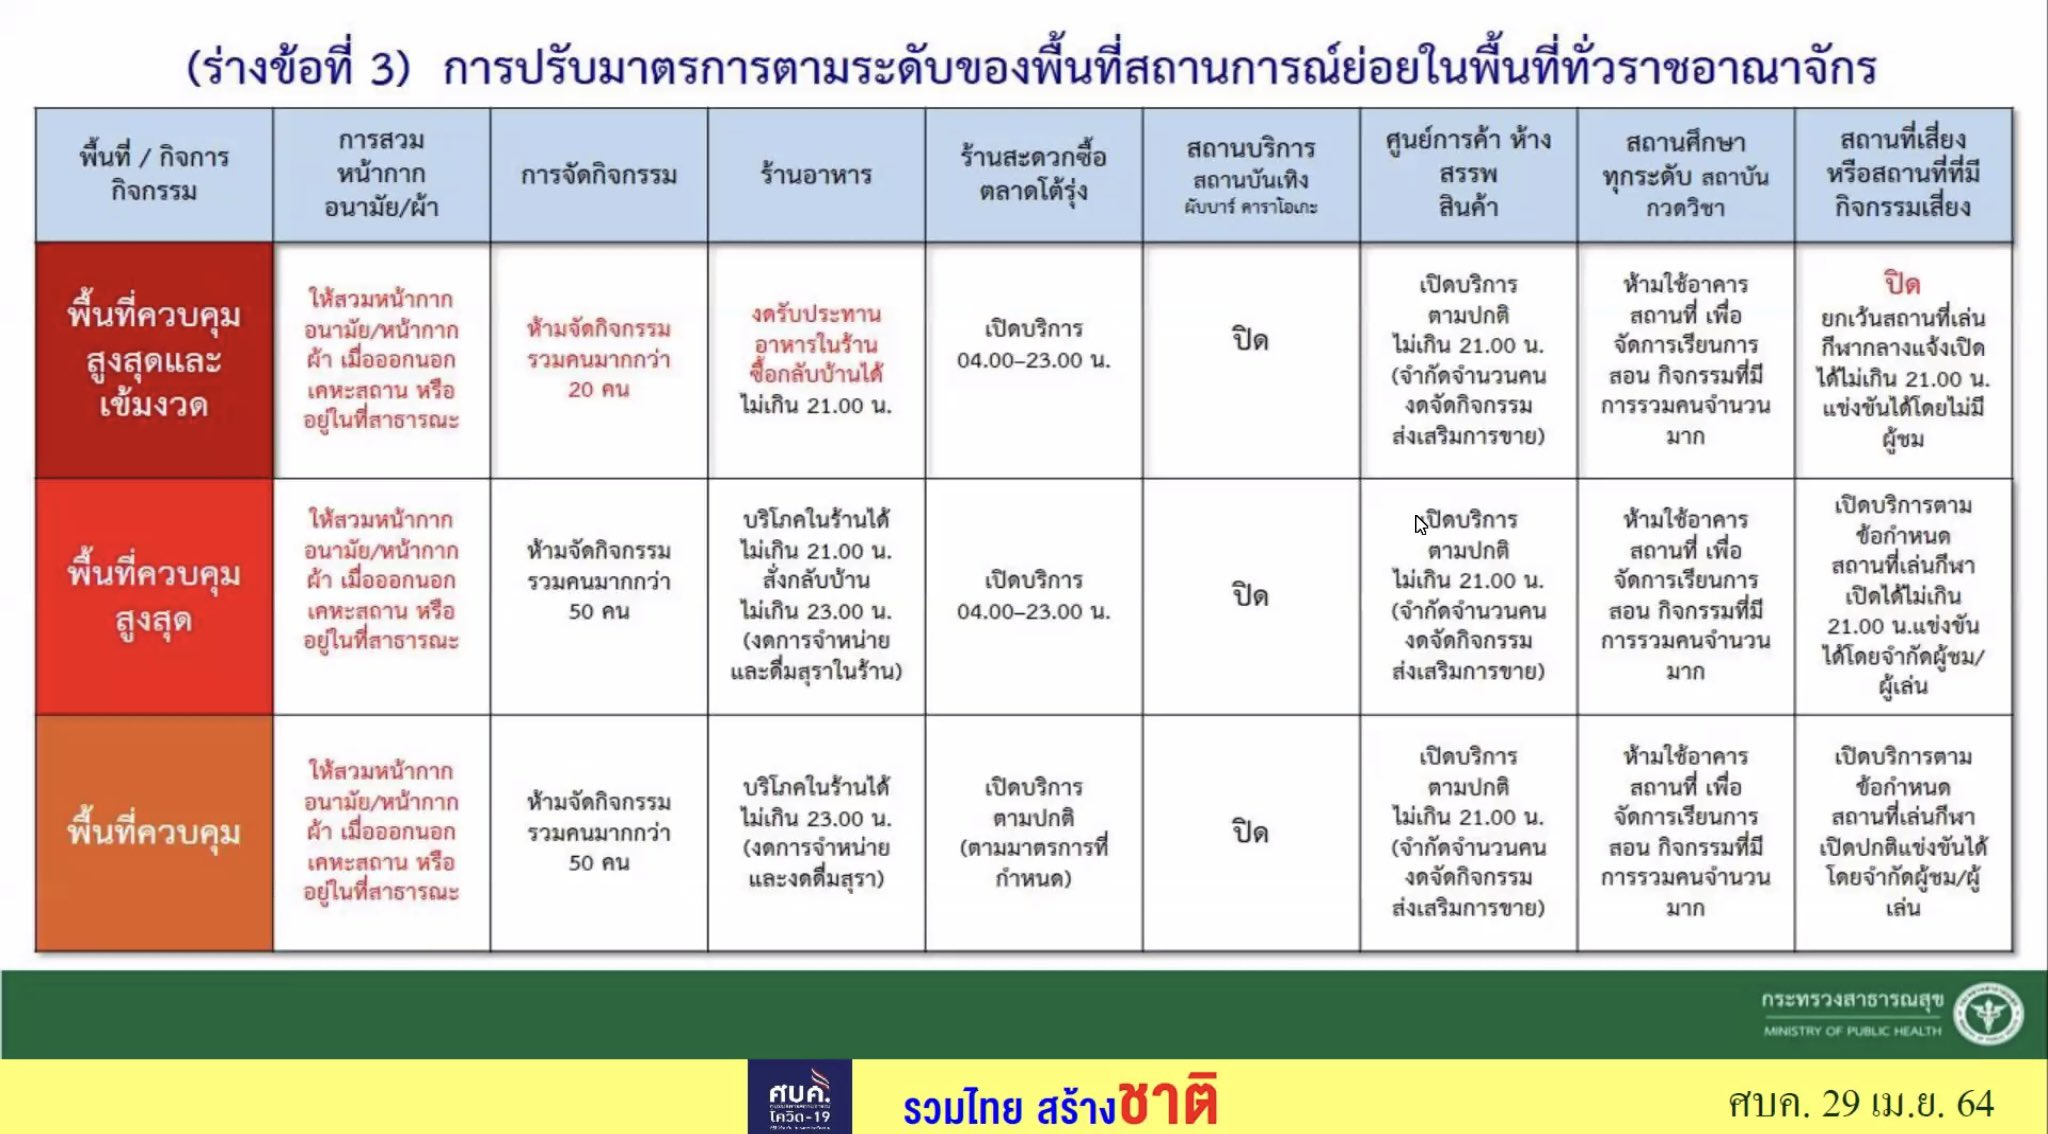 www.thaiguide.dk/images/forum/covid19/nationale%20nedlukninger%2029-04-21.jpeg